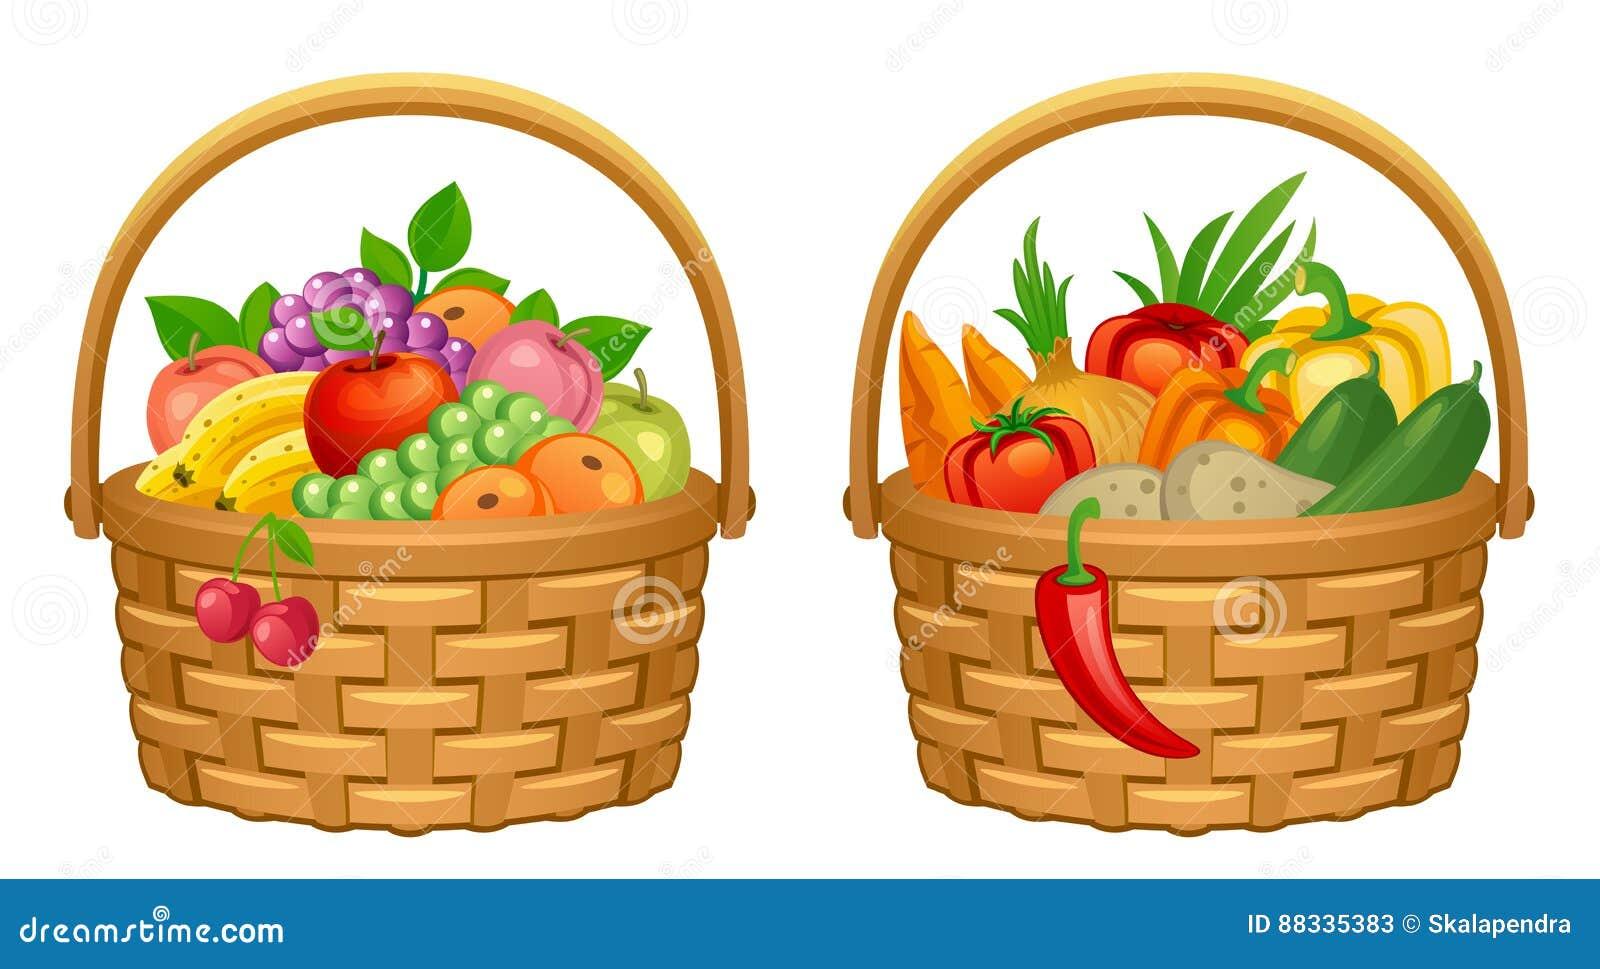 harvest cartoons  illustrations   vector stock images red apple outline clip art apple outline clip art free